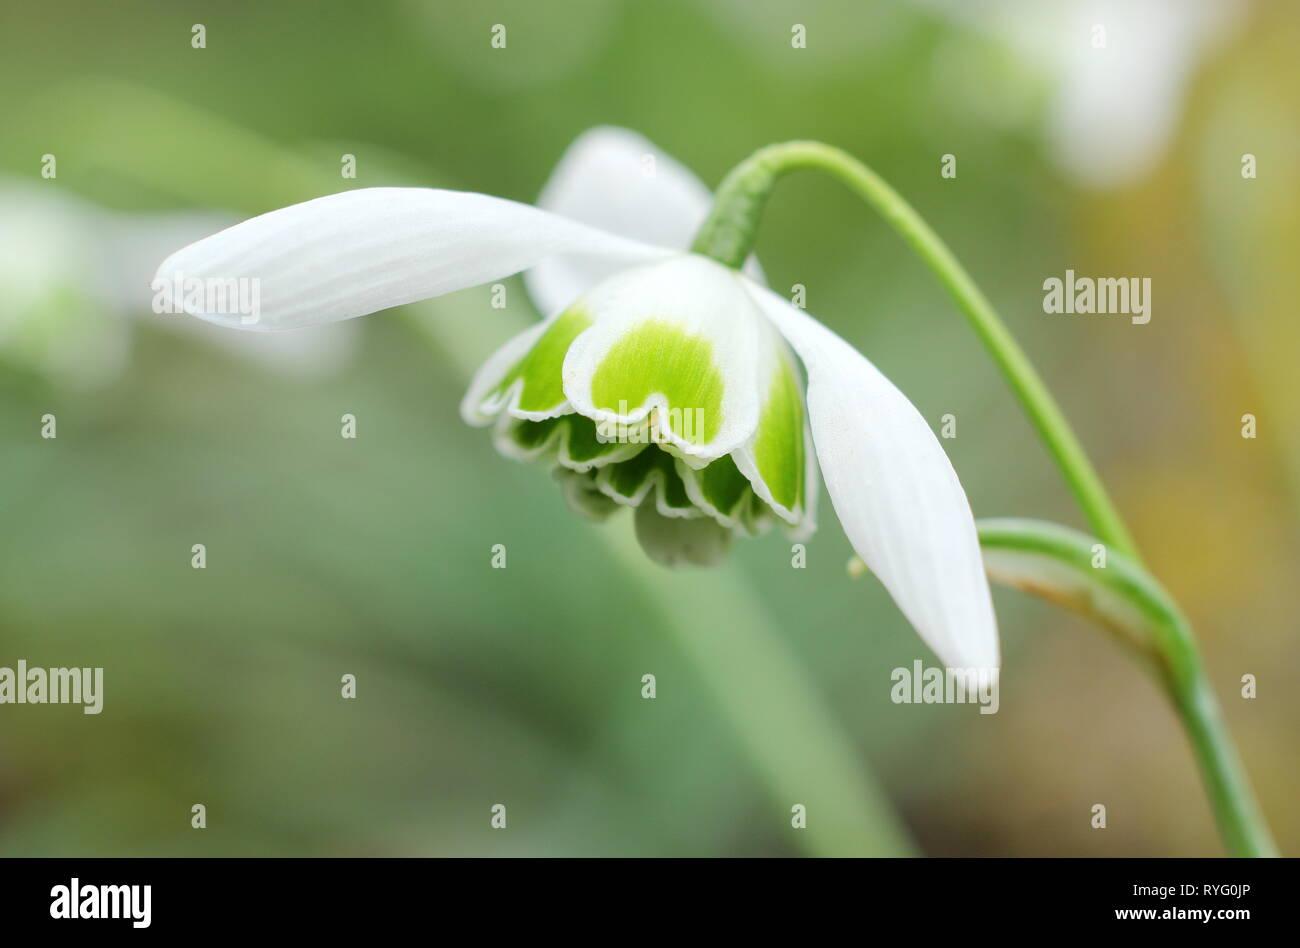 Galanthus 'Titania'. Blooms of Snowdrop 'Titania', a Greatorex double snowdrop in February, UK garden. - Stock Image